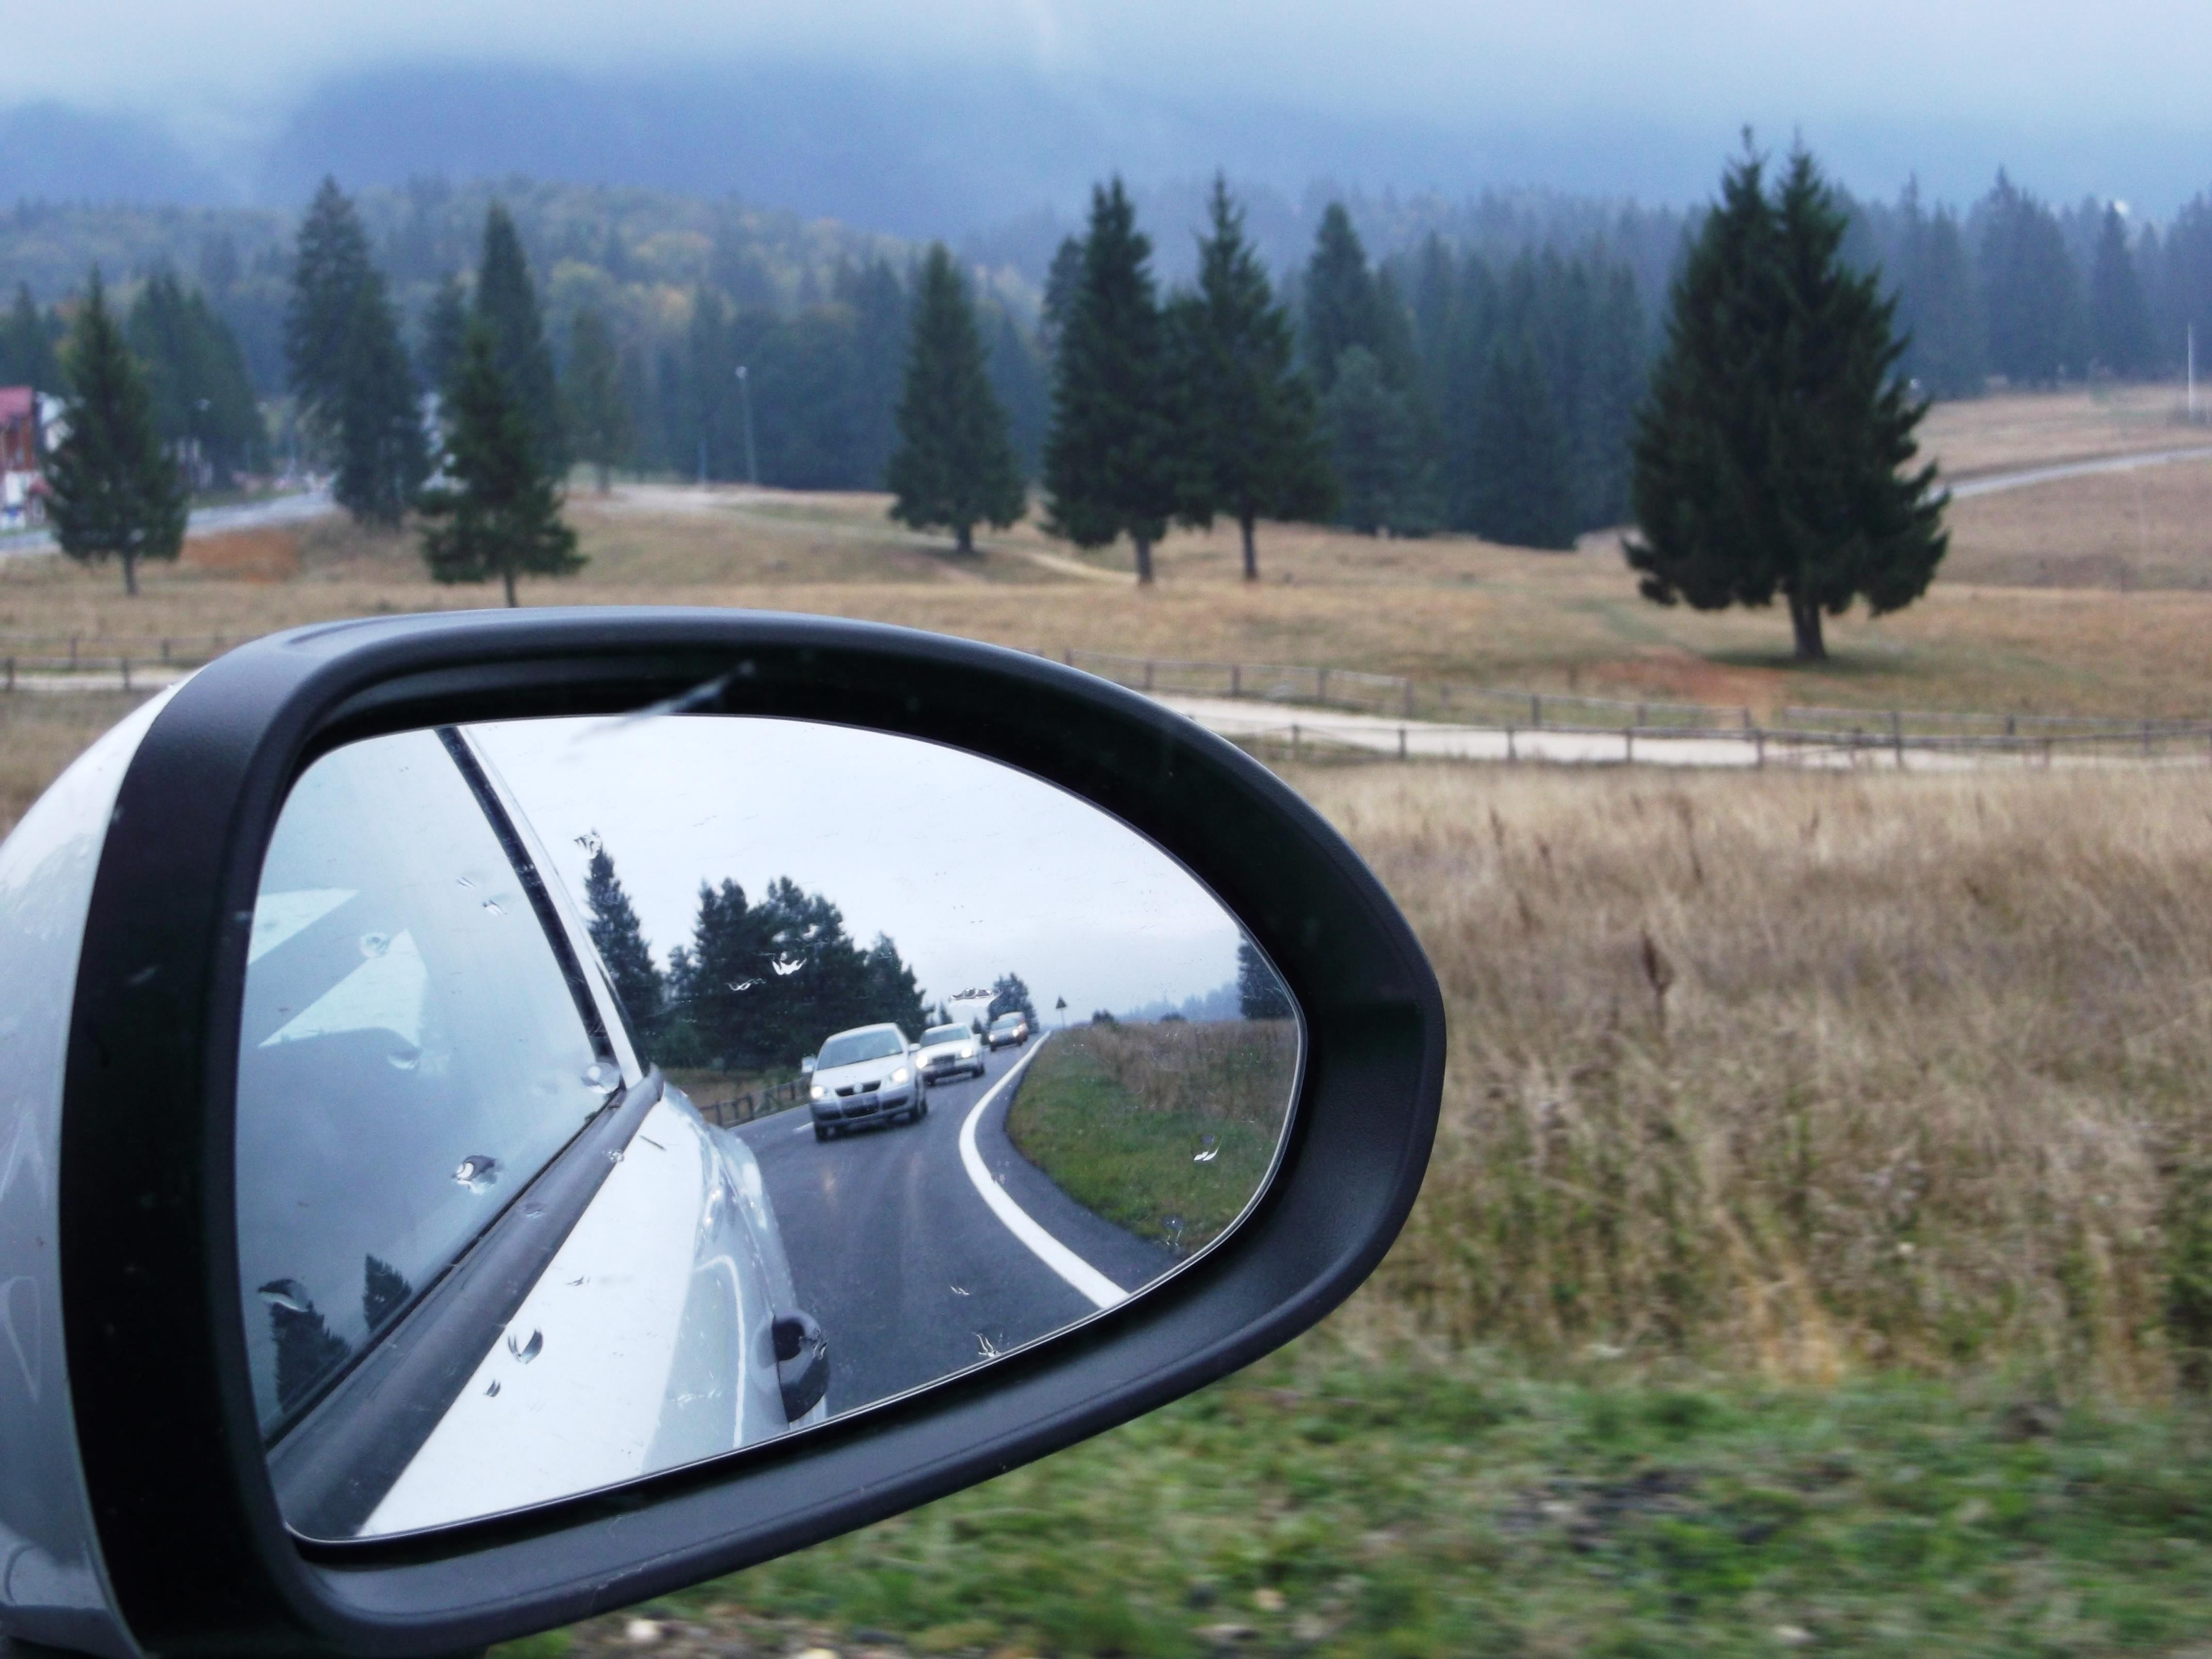 Romania's Jan-Apr new passenger car registrations jump 22.3% - ACEA